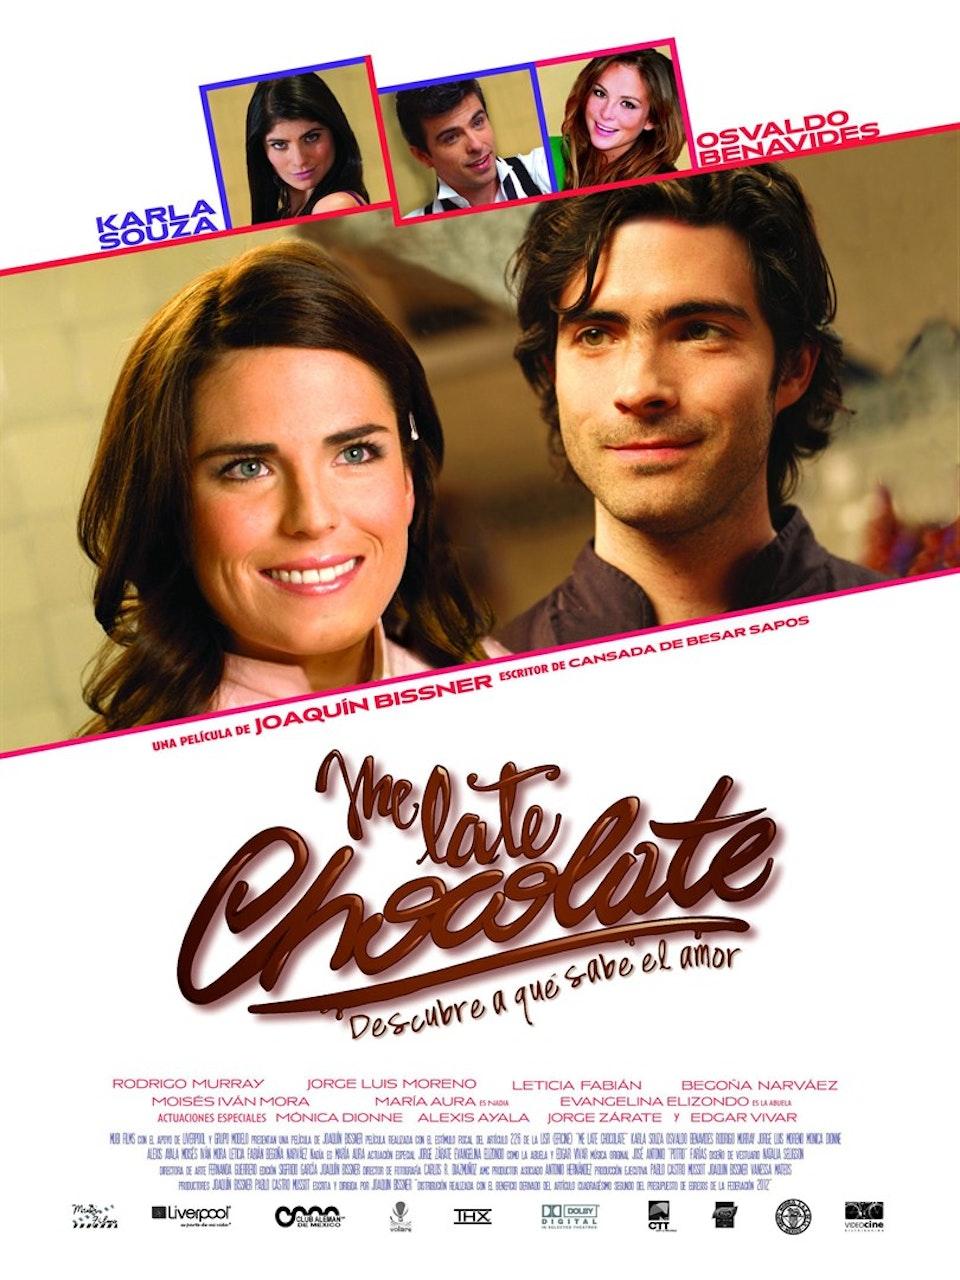 I Fancy Chocolate / Me Late Chocolate -